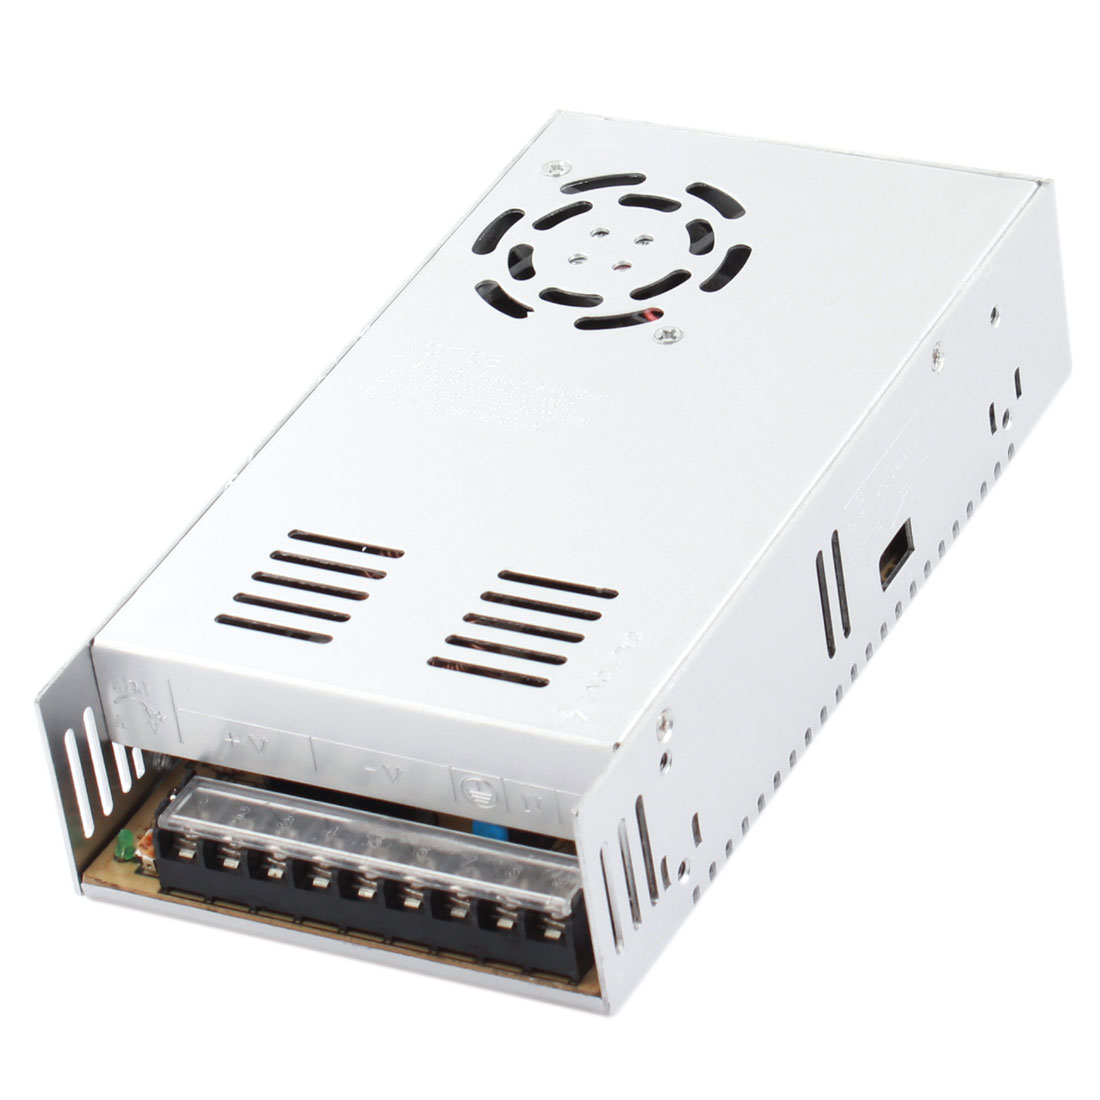 AC 110/220V to DC 24V 15A Single Output LED Strip Light Power Supply Switch Converter